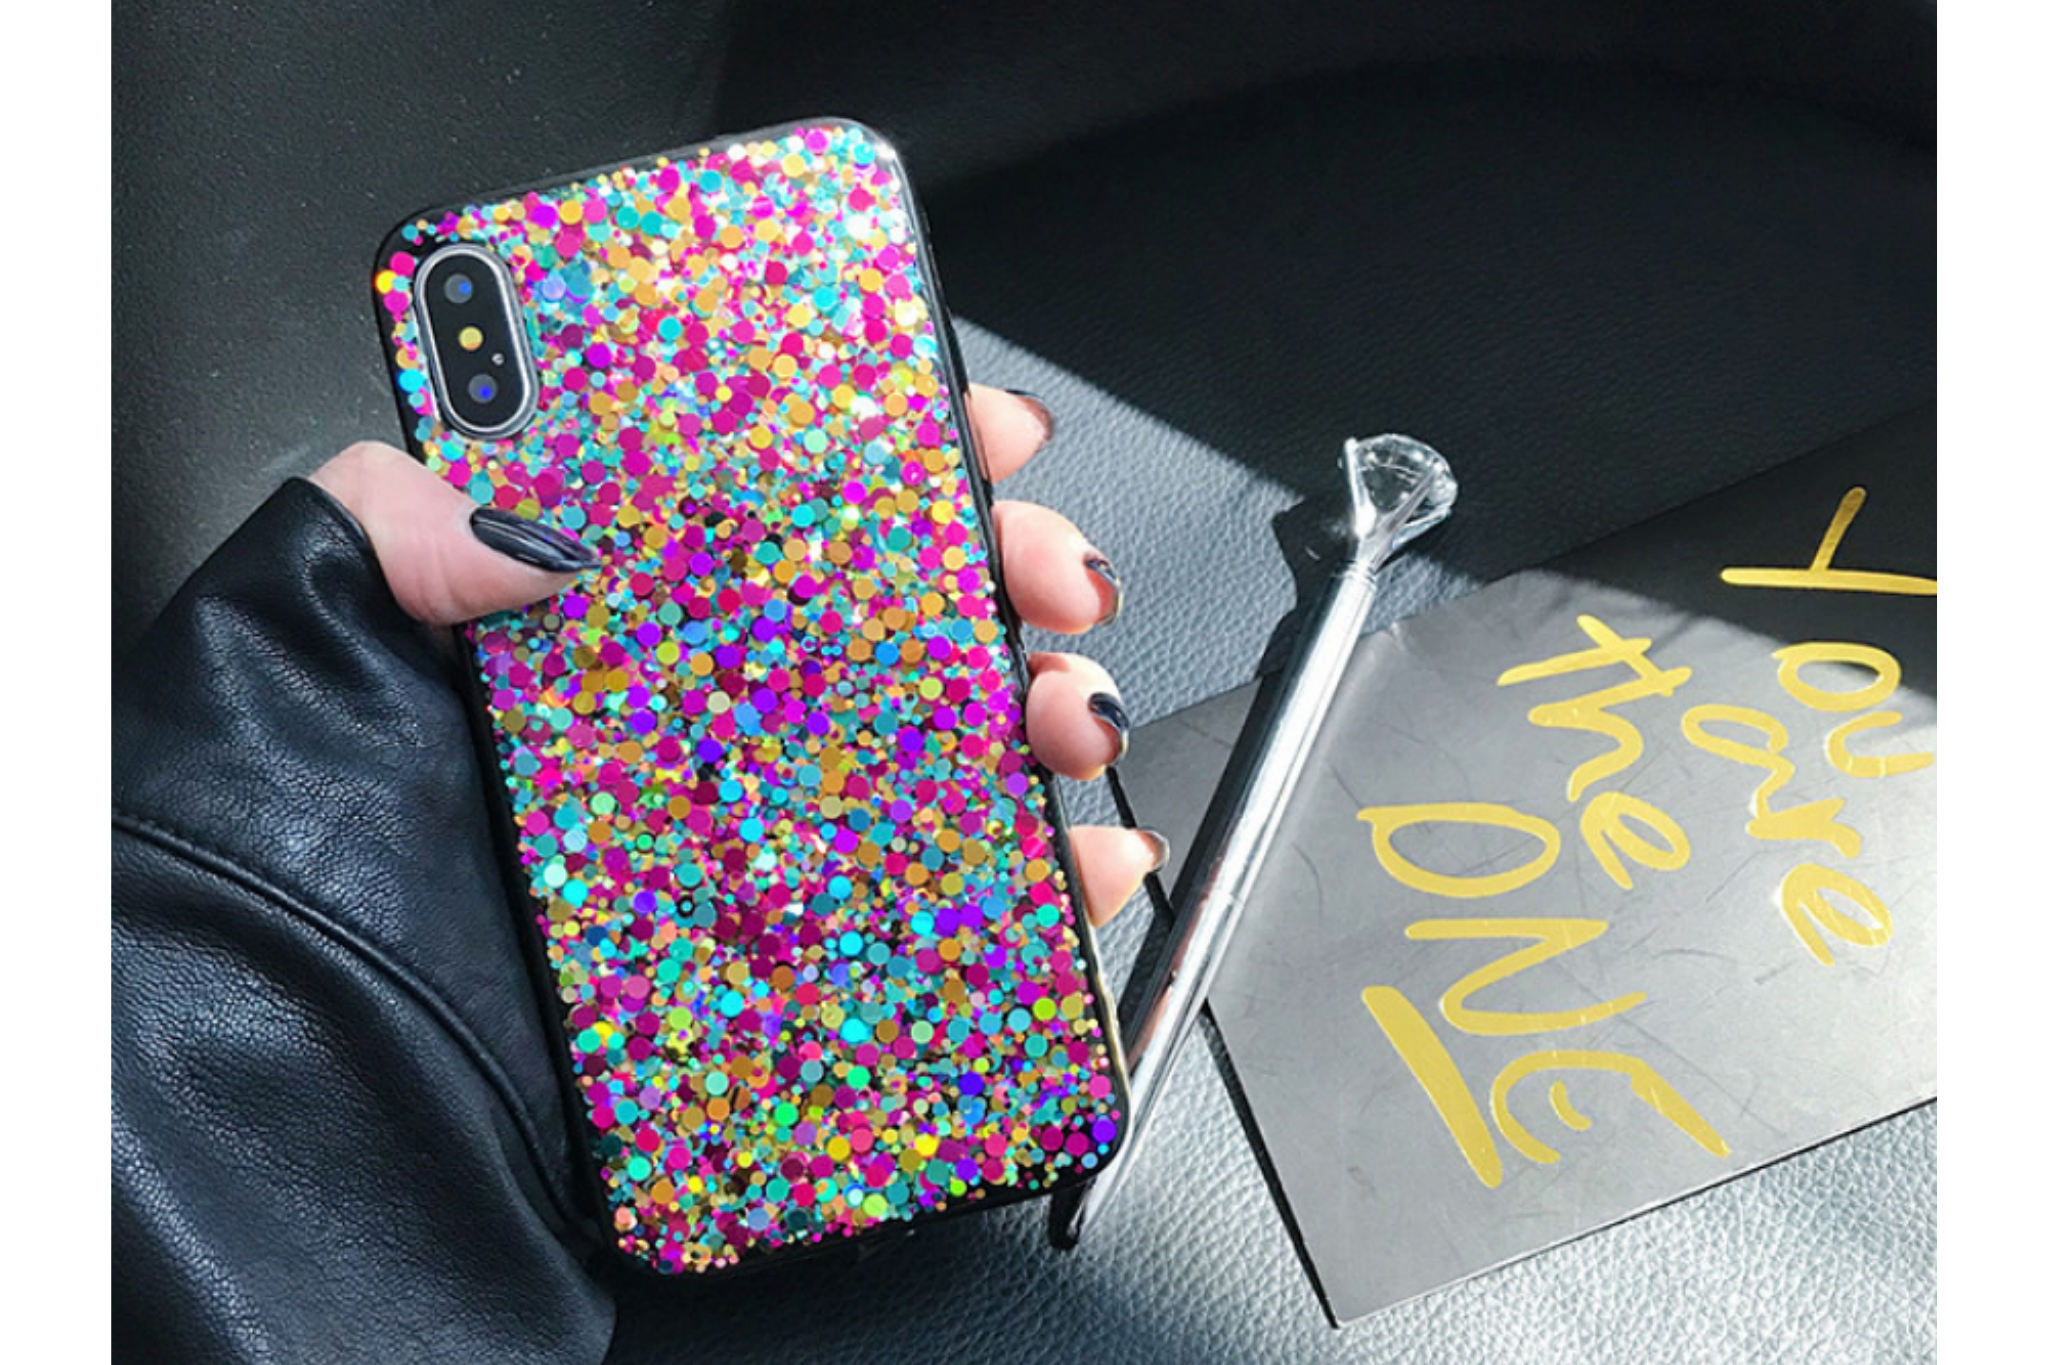 Smartphonehoesje iPhone 11 | Bling met glitters | Multicolor